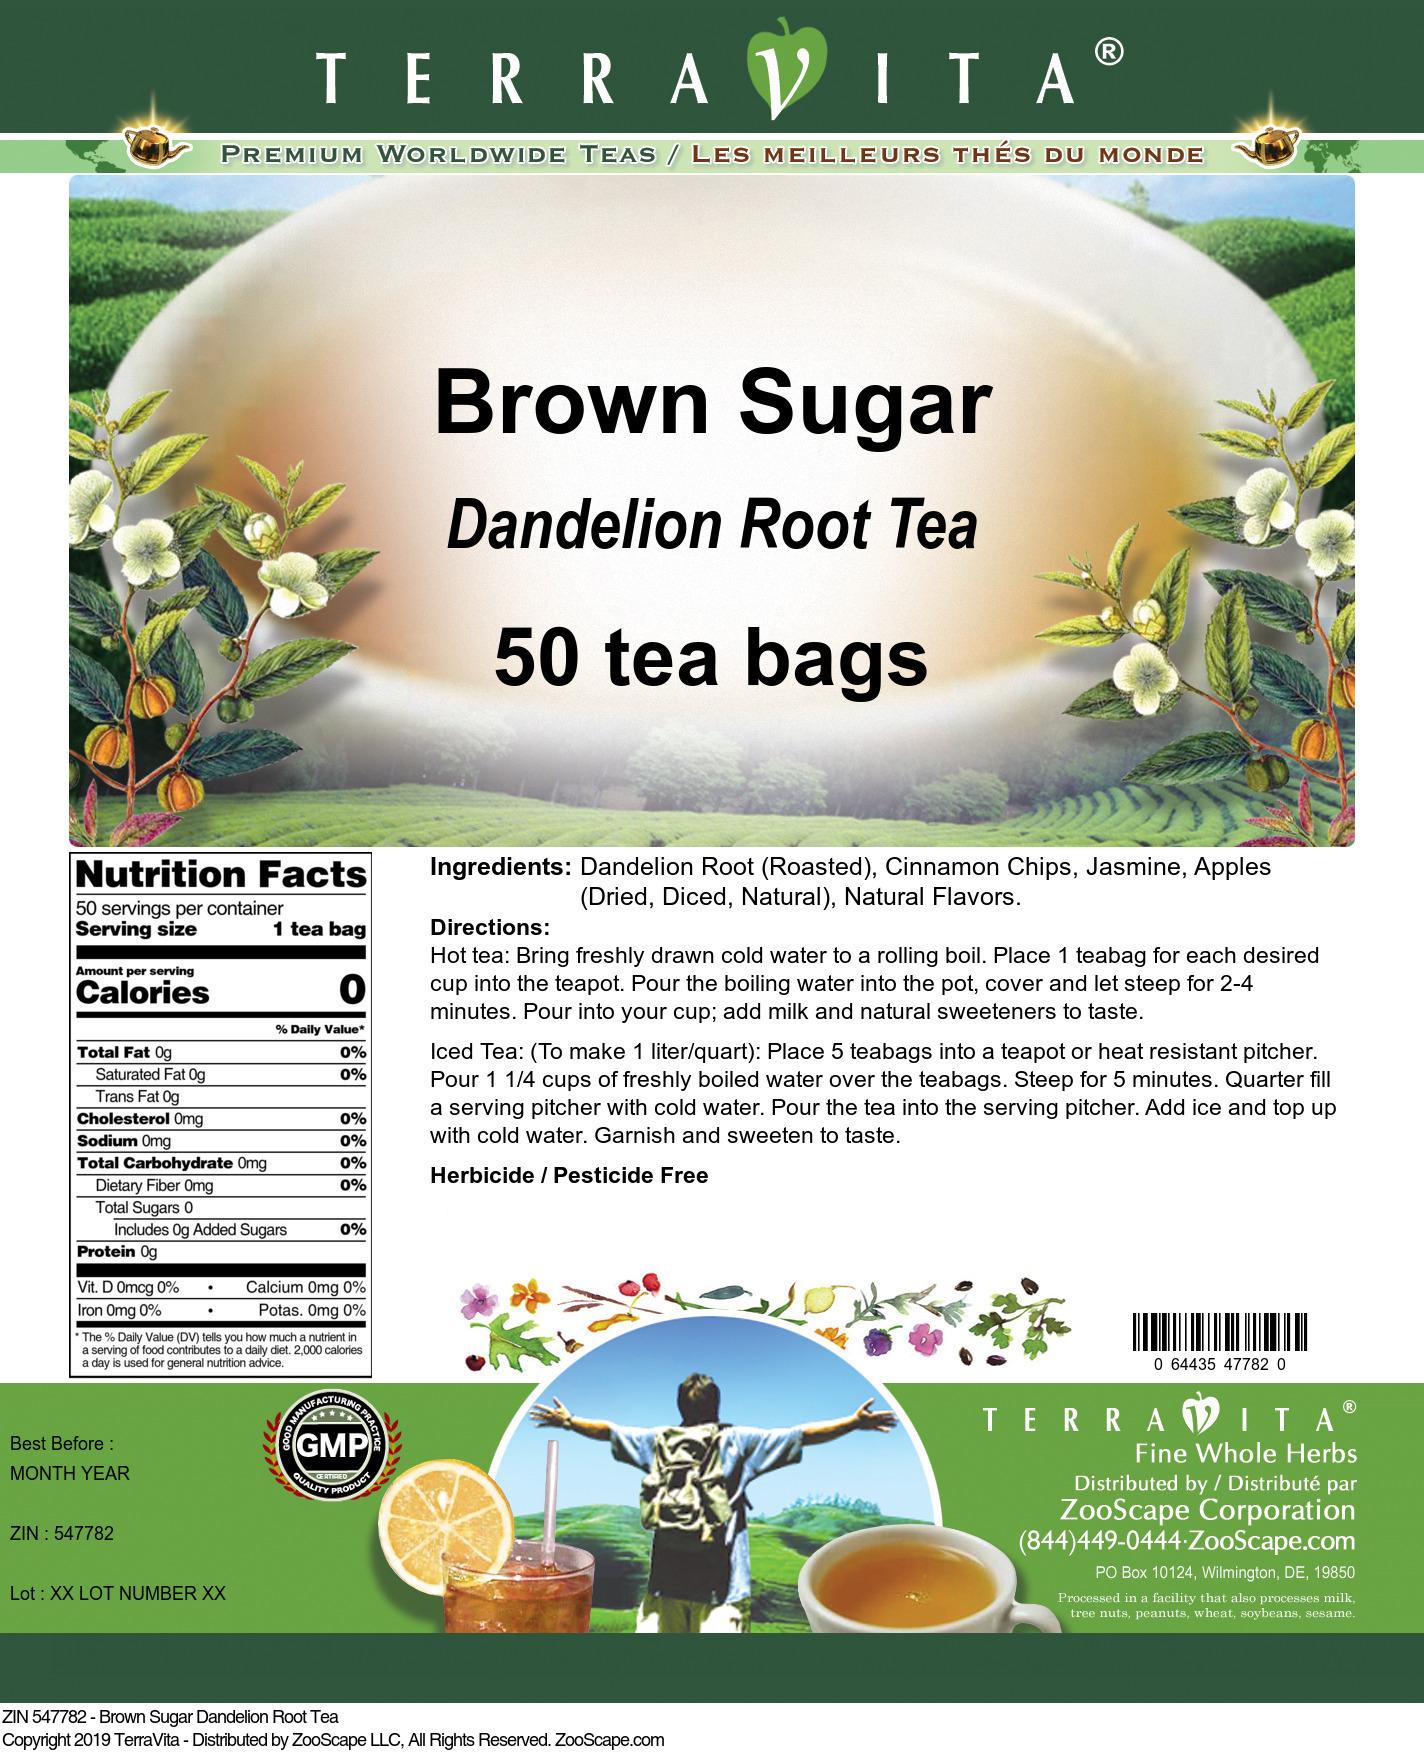 Brown Sugar Dandelion Root Tea